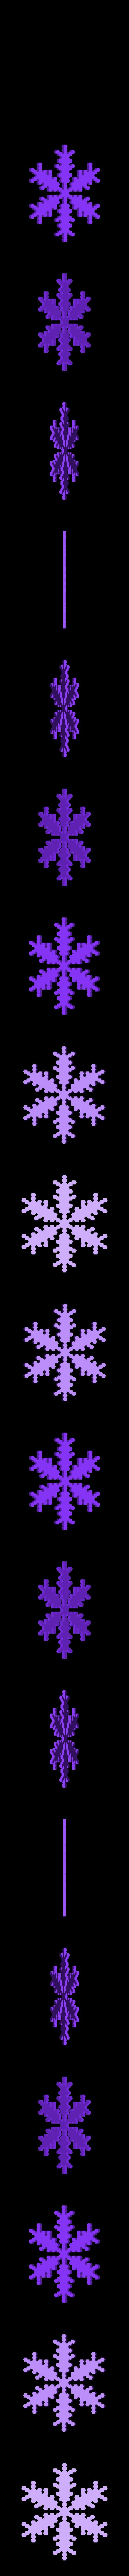 reiter20-1.6-0.7-0.002-30.stl Download free STL file Snowflake growth simulation in BlocksCAD • 3D printing design, arpruss